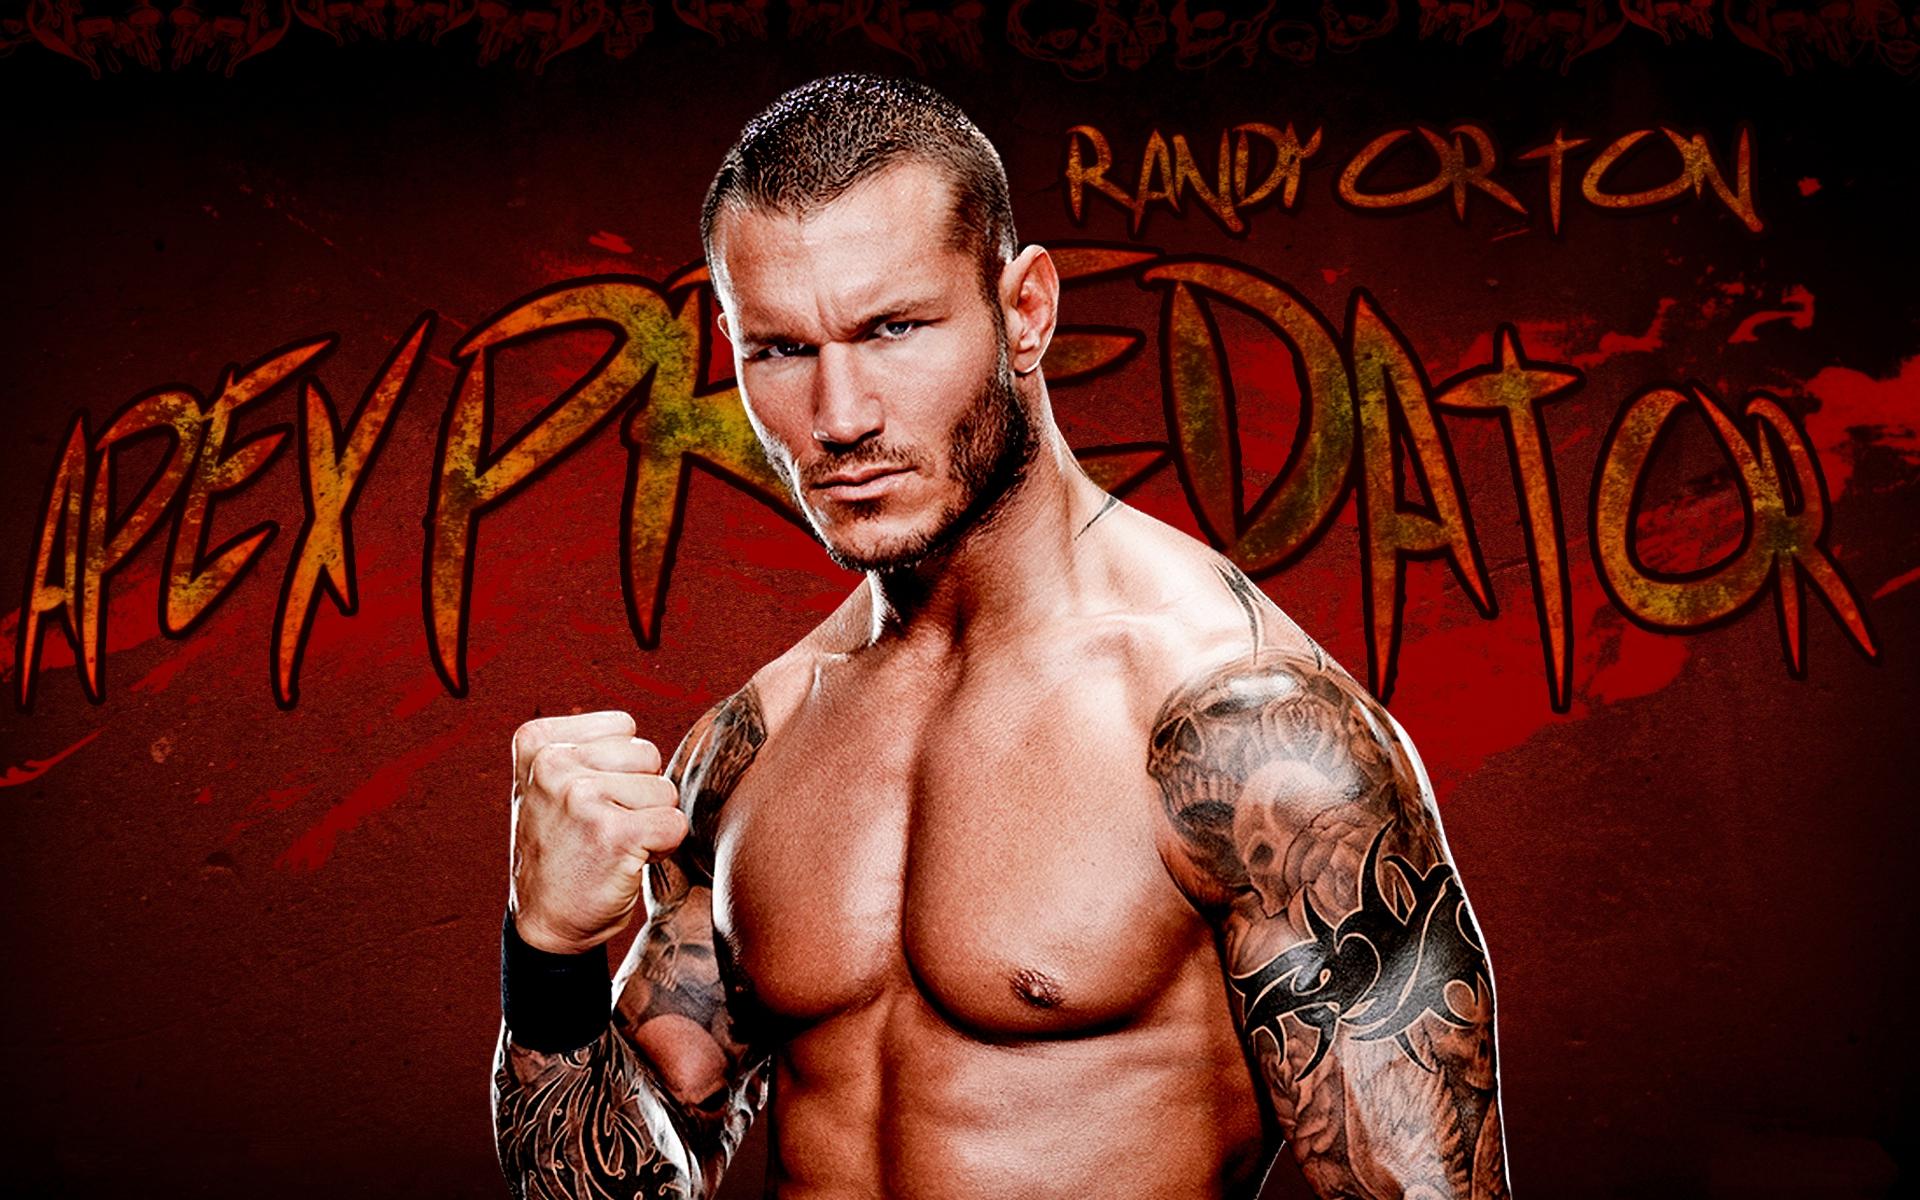 Randy Orton Wallpapers Free Download